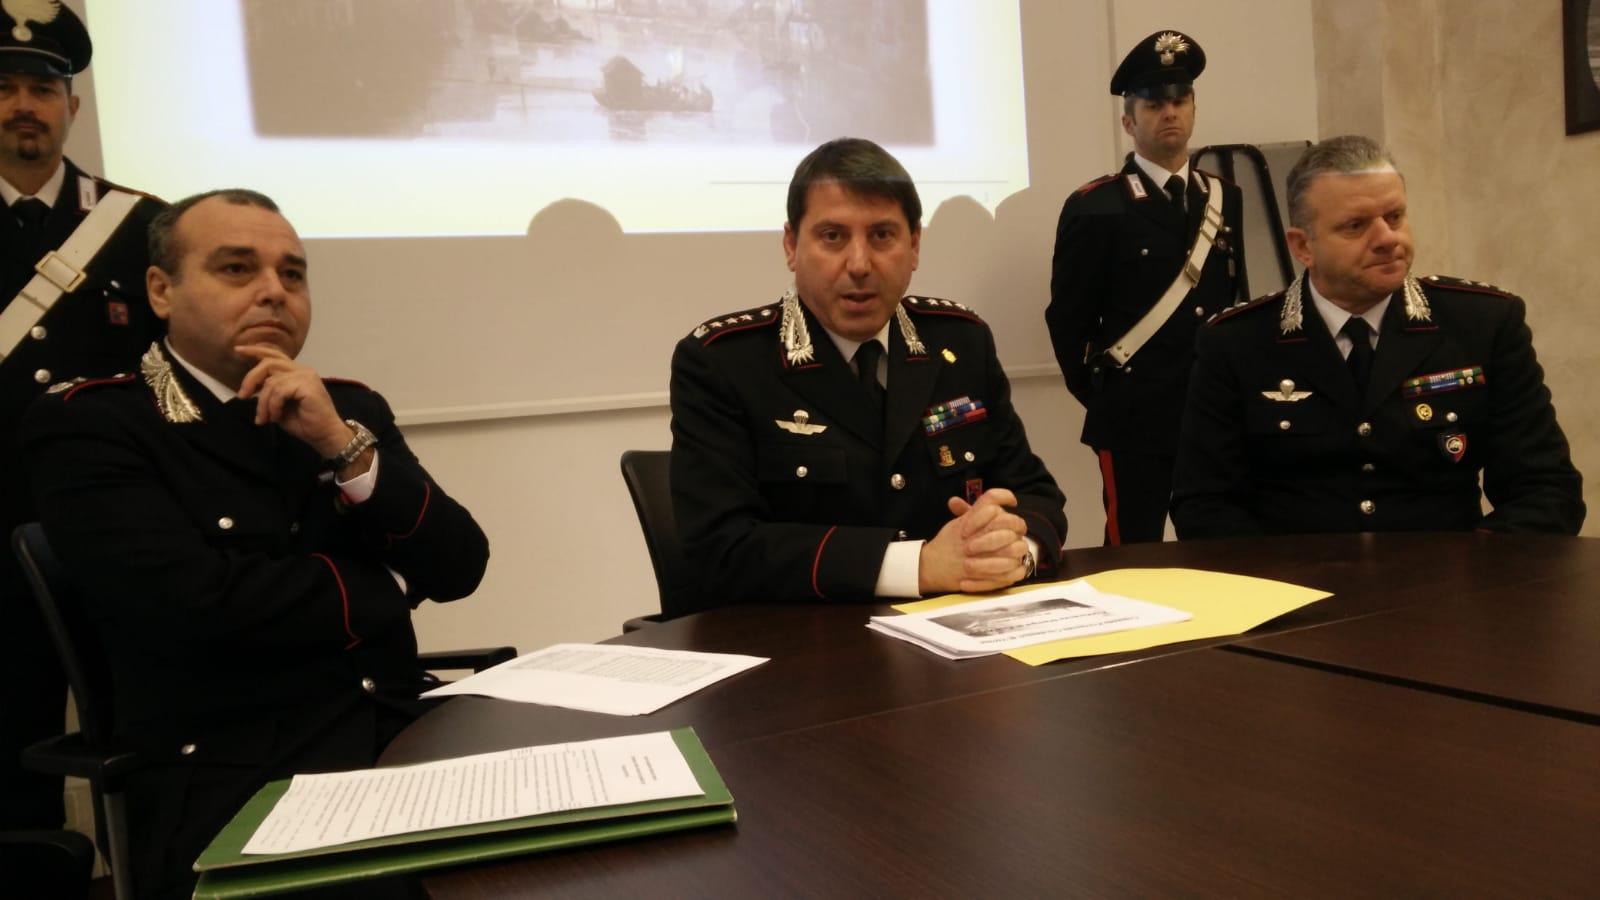 8763354468 Insieme Al Comando Provinciale Di Verona - Querciacb